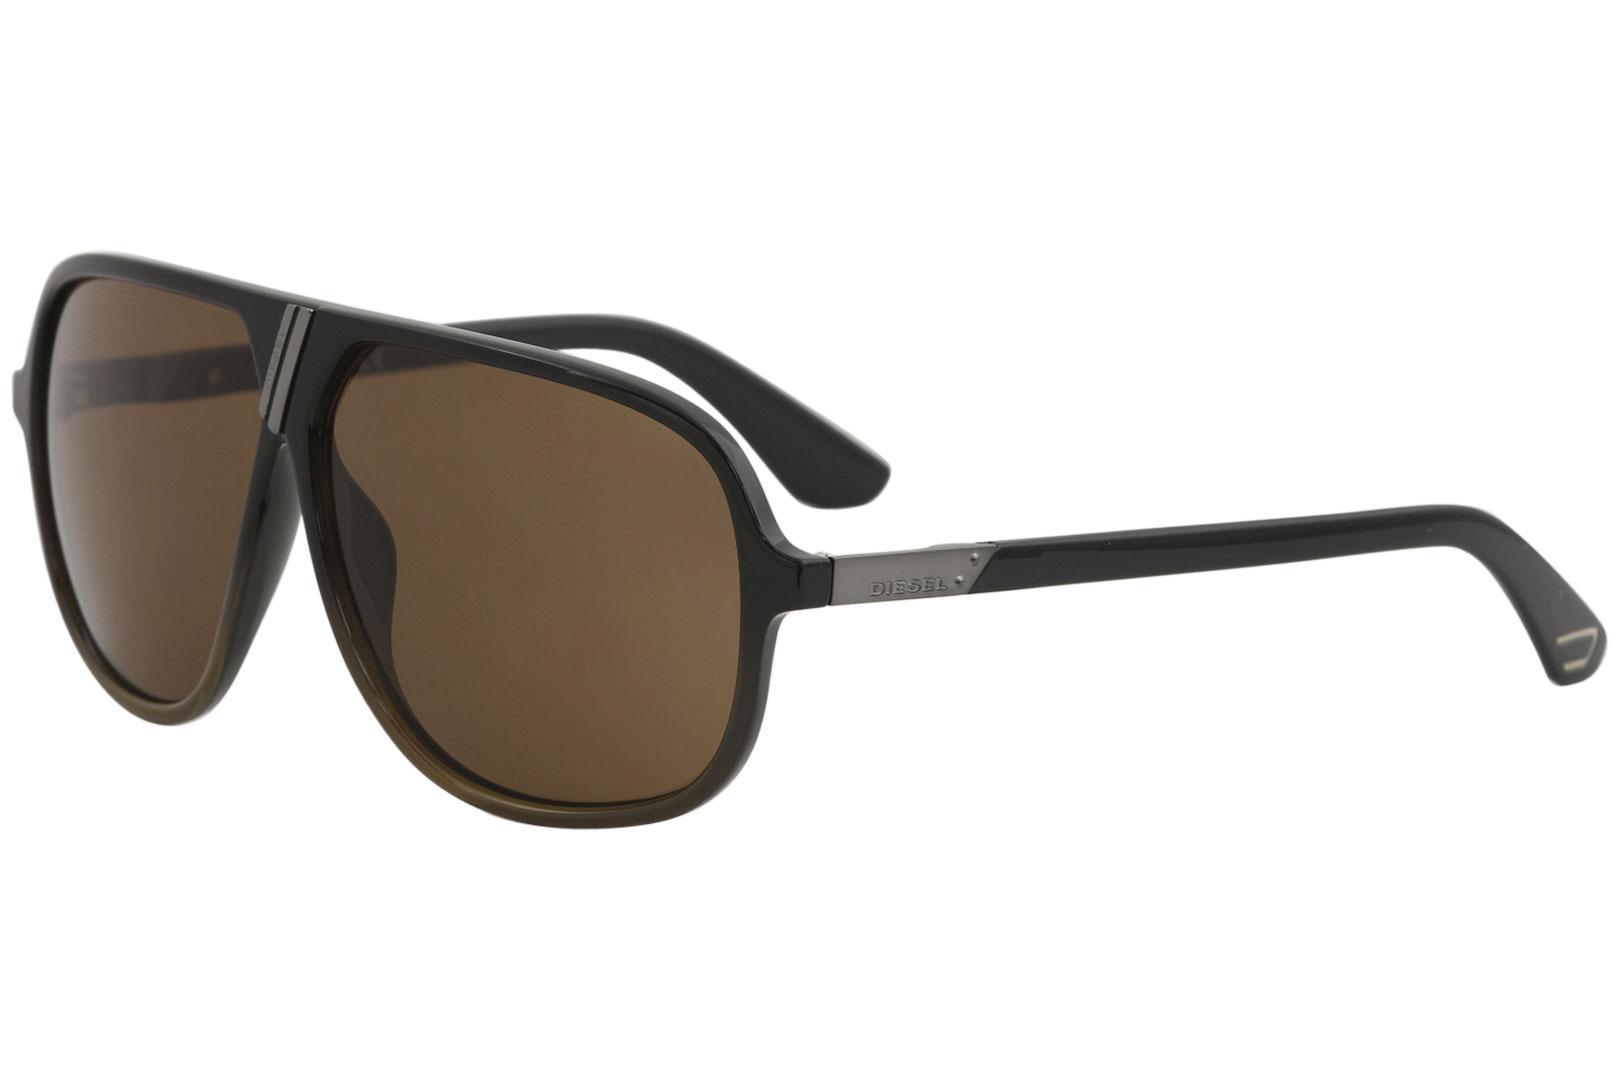 1b27e3c019 Diesel Men s DL0043 DL 0043 Retro Pilot Sunglasses